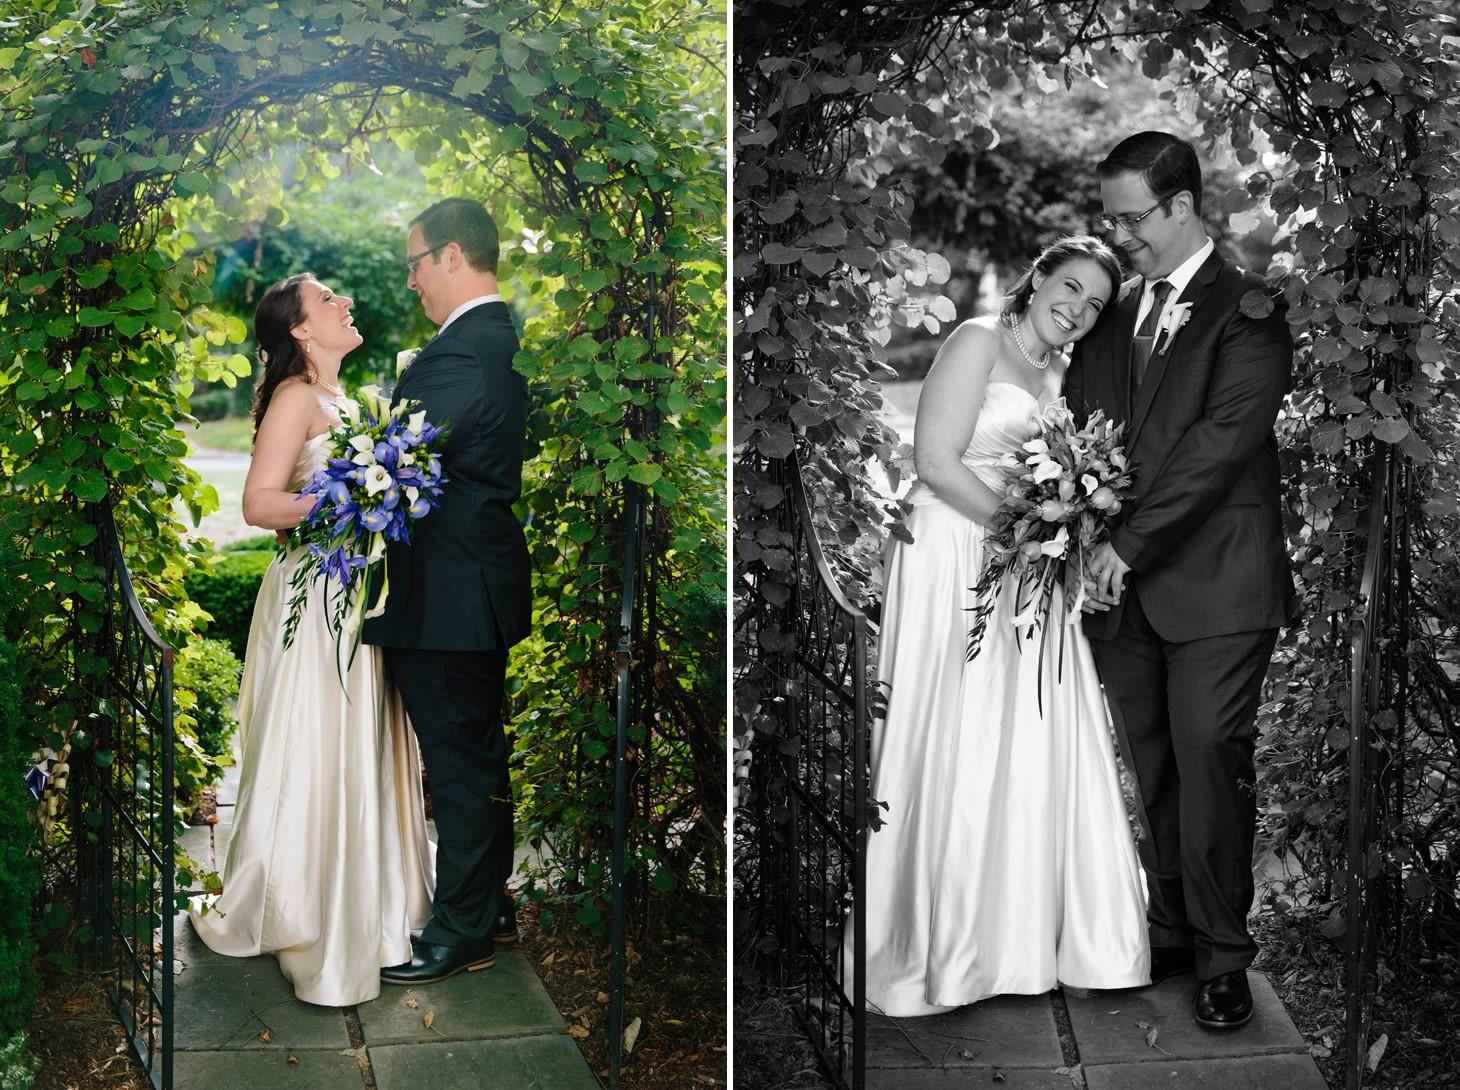 031-nyc-wedding-photographer-hoboken-waterfront-wedding-photos-smitten-chickens.jpg